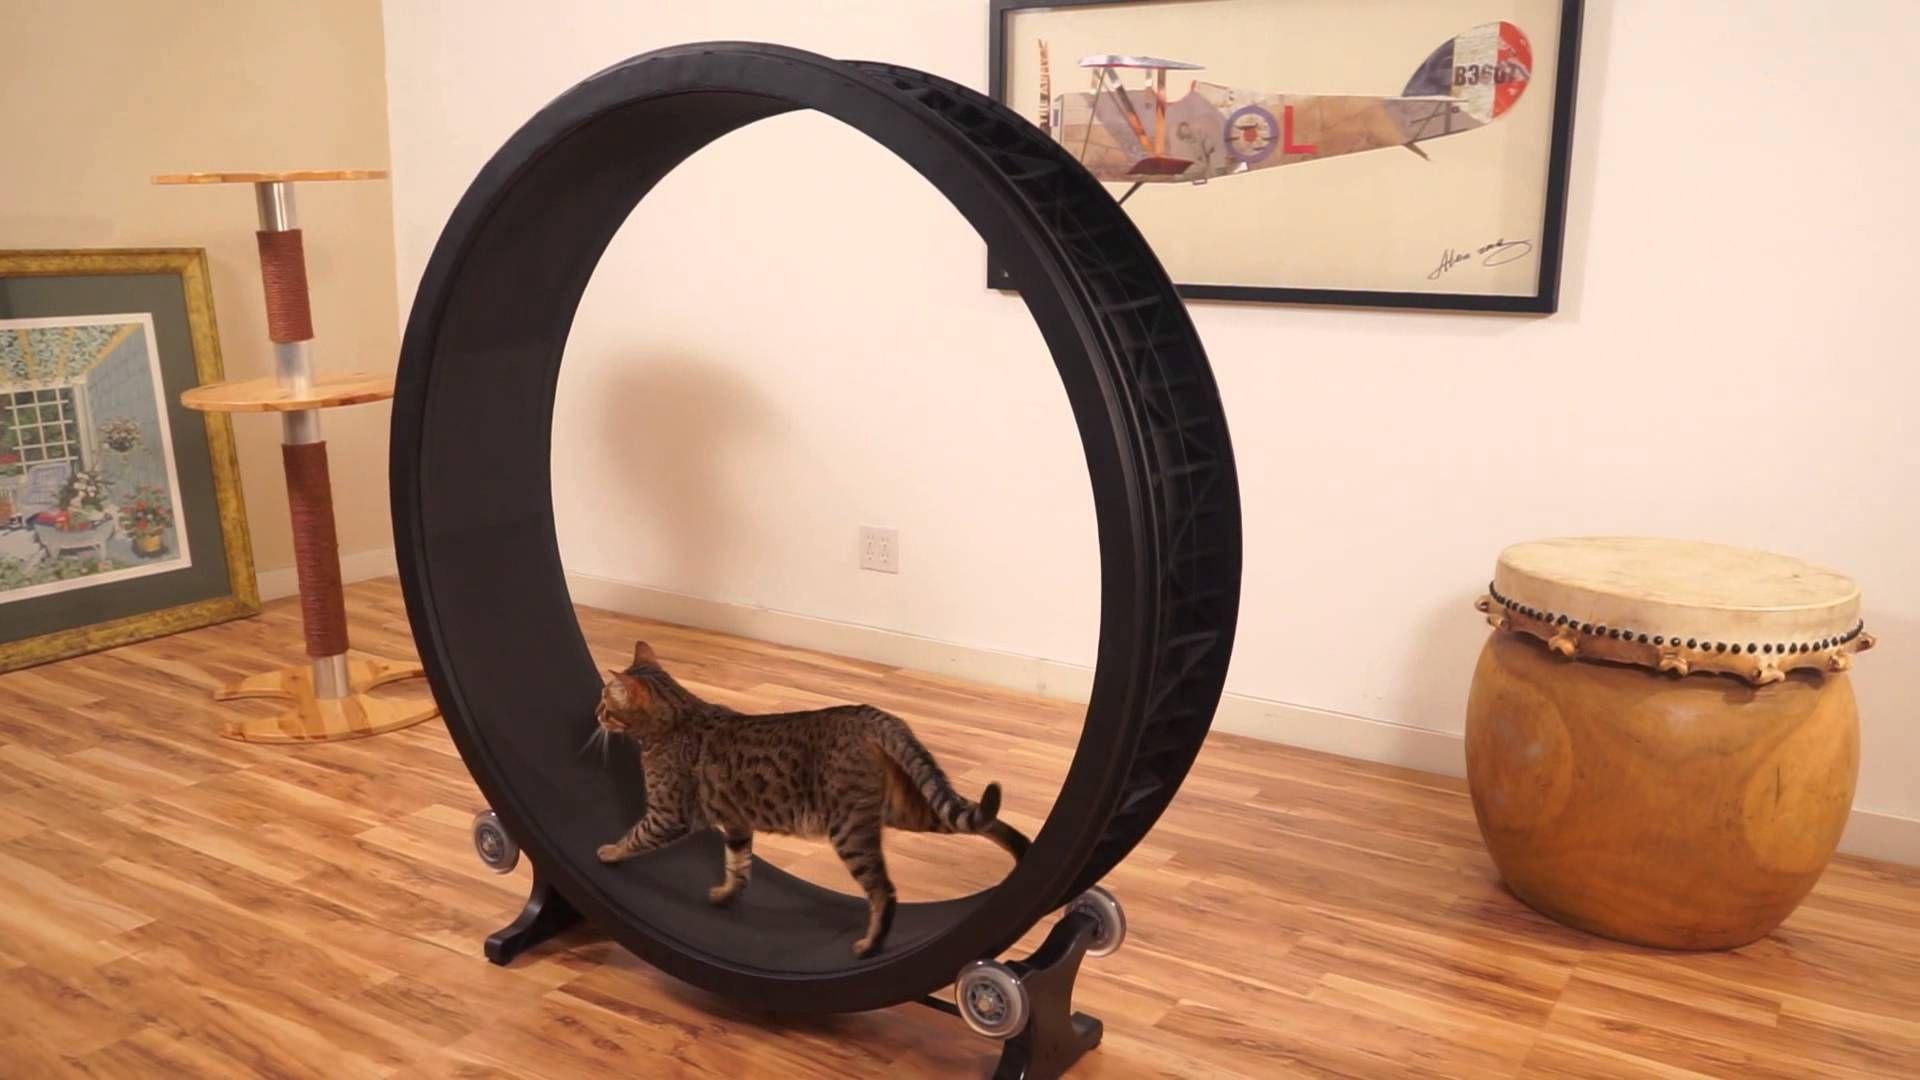 práctico y gatuno https://www.kickstarter.com/projects/620439316/one-fast-cat-exercise-wheel